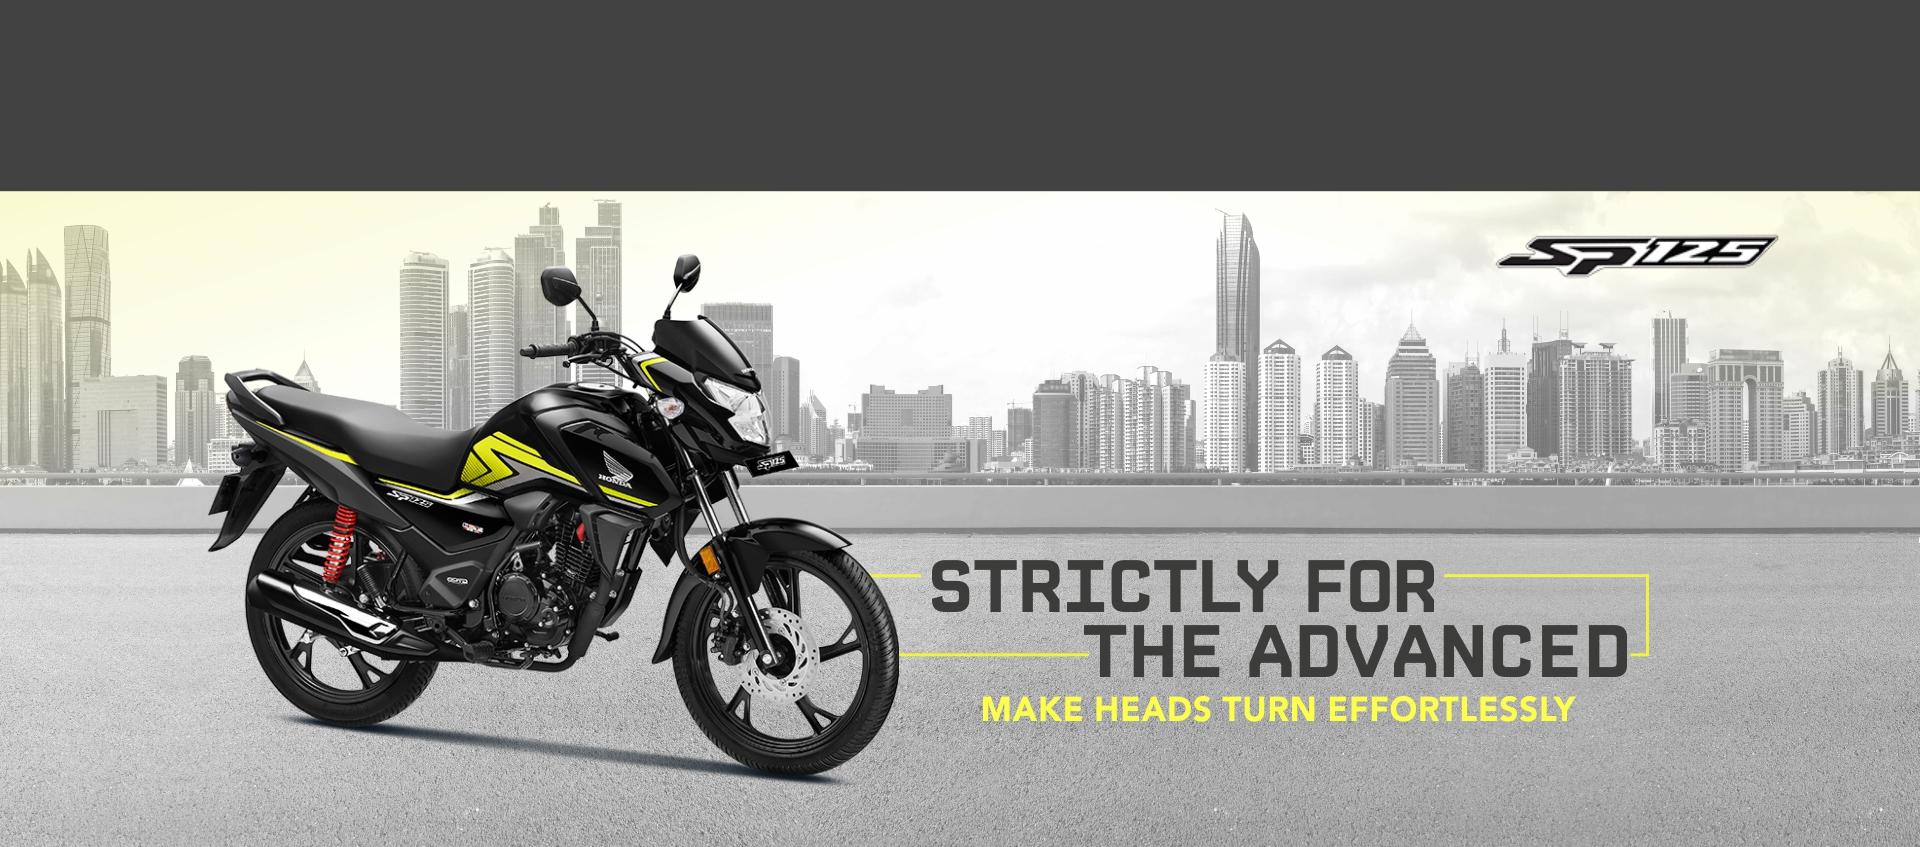 Introducing Honda SP 125